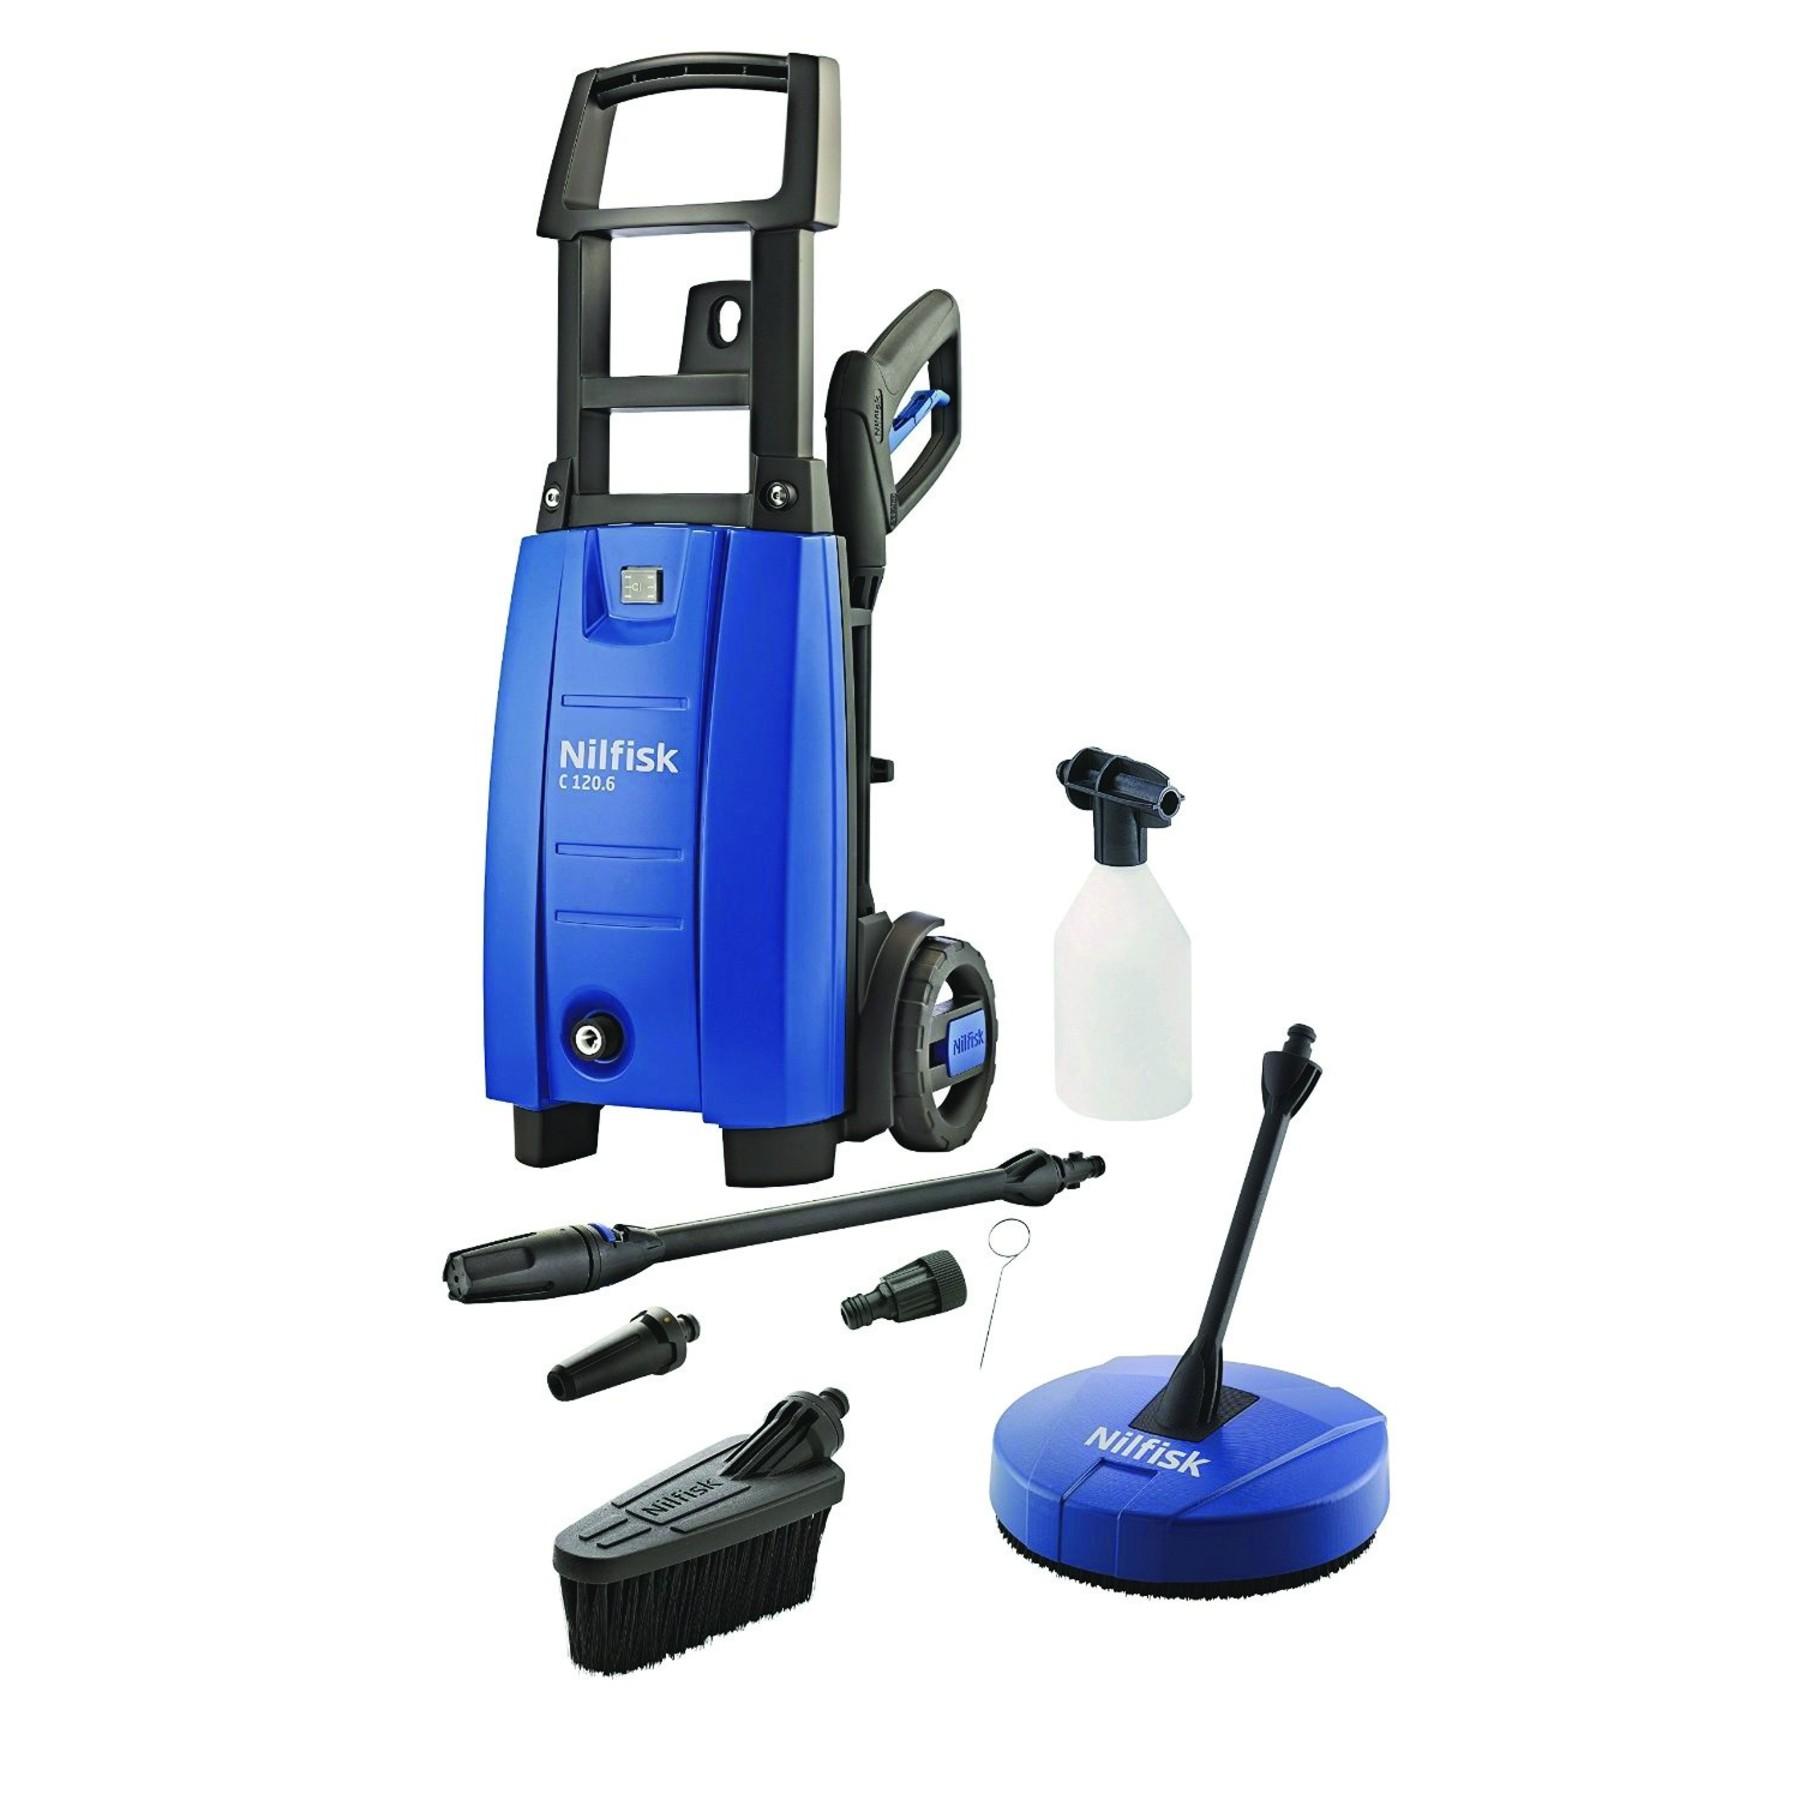 Nilfisk C120 6-6 PCA X-Tra High Performance Pressure Washer & Patio Cleaner Set | eBay